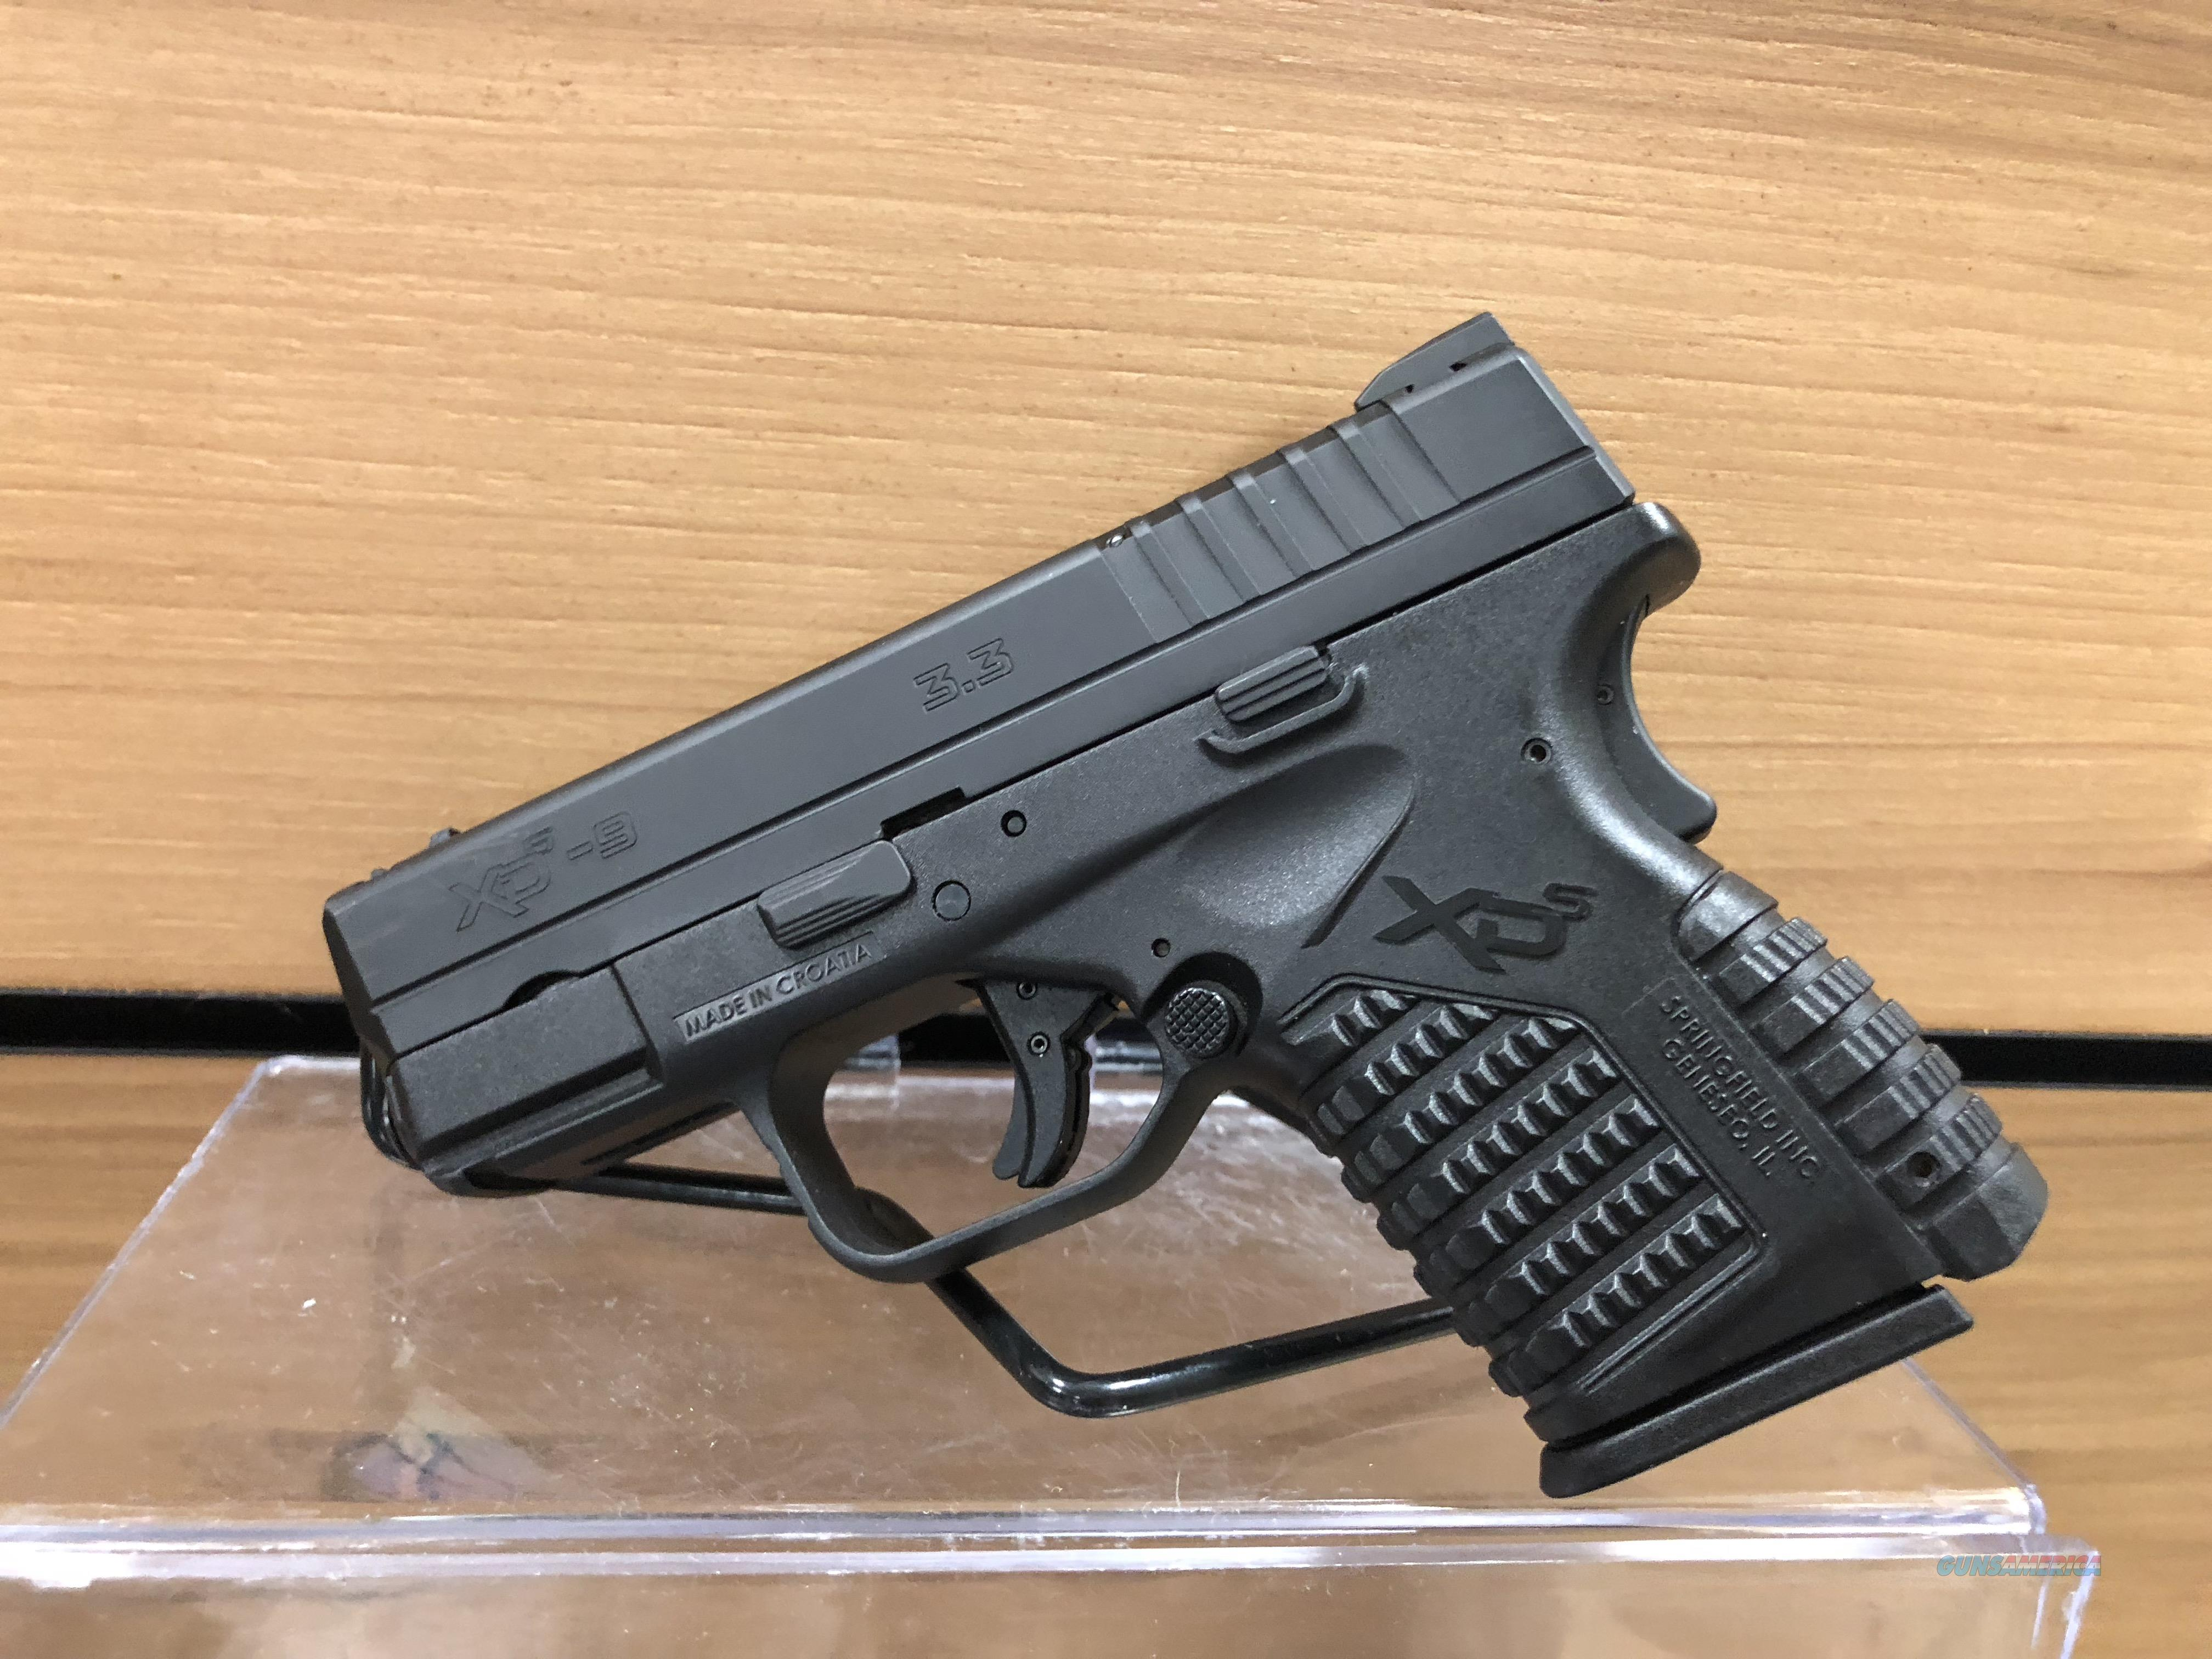 USED SPRINGFIELD XDS, 9MM  Guns > Pistols > Springfield Armory Pistols > XD-S